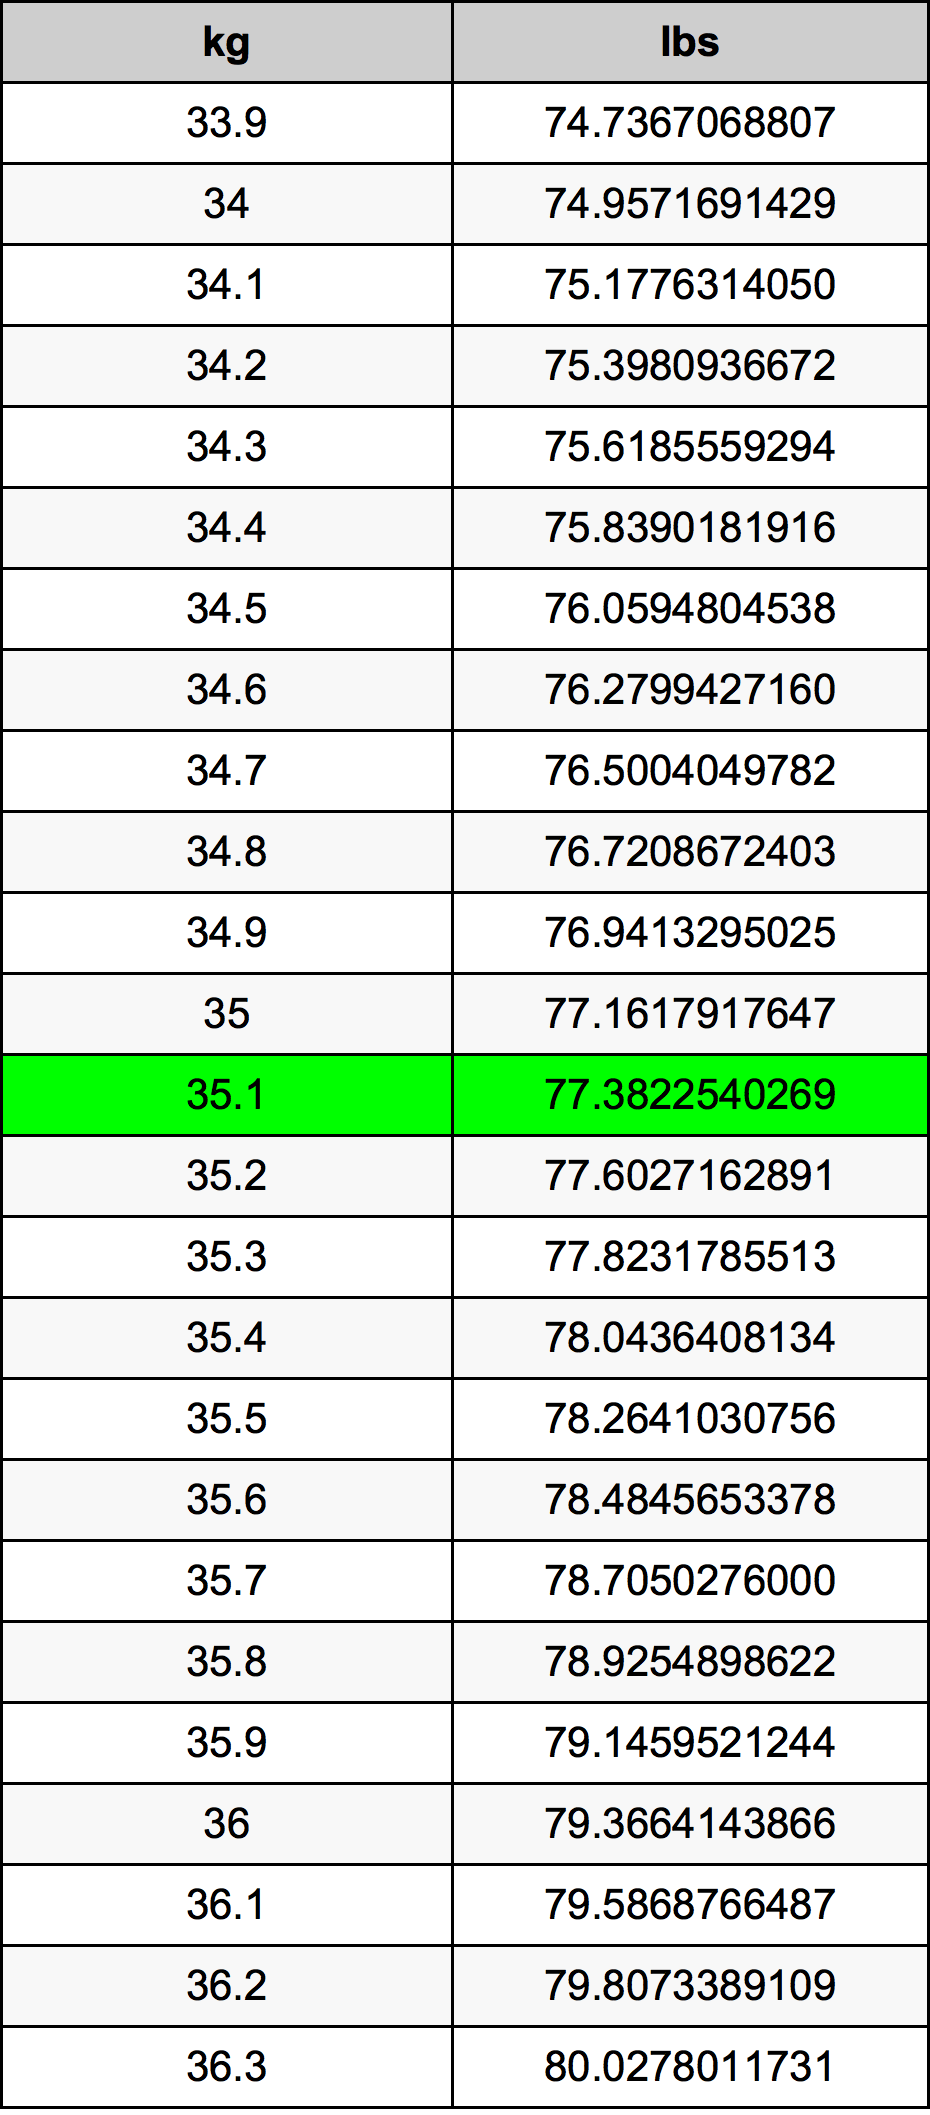 35.1 Kilogramma konverżjoni tabella